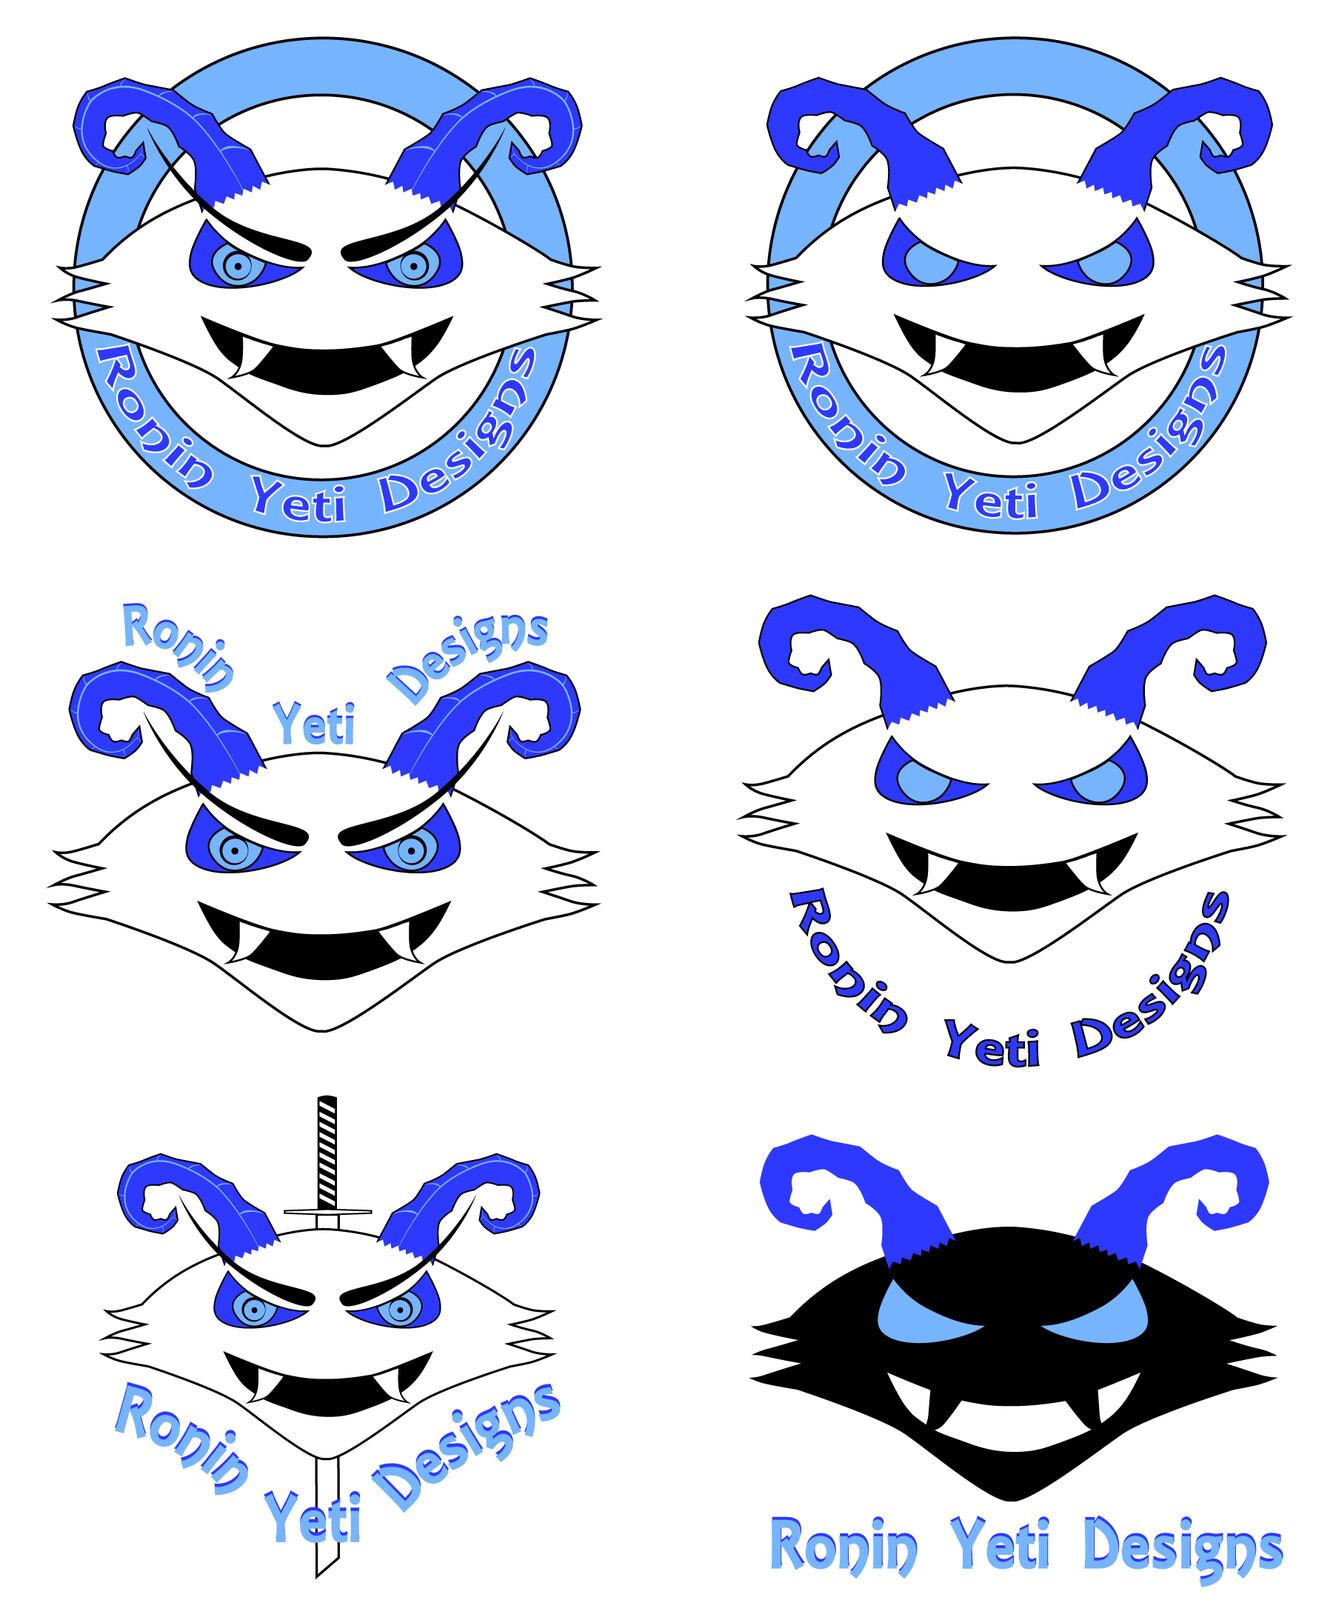 Original concepts for the 2nd logo